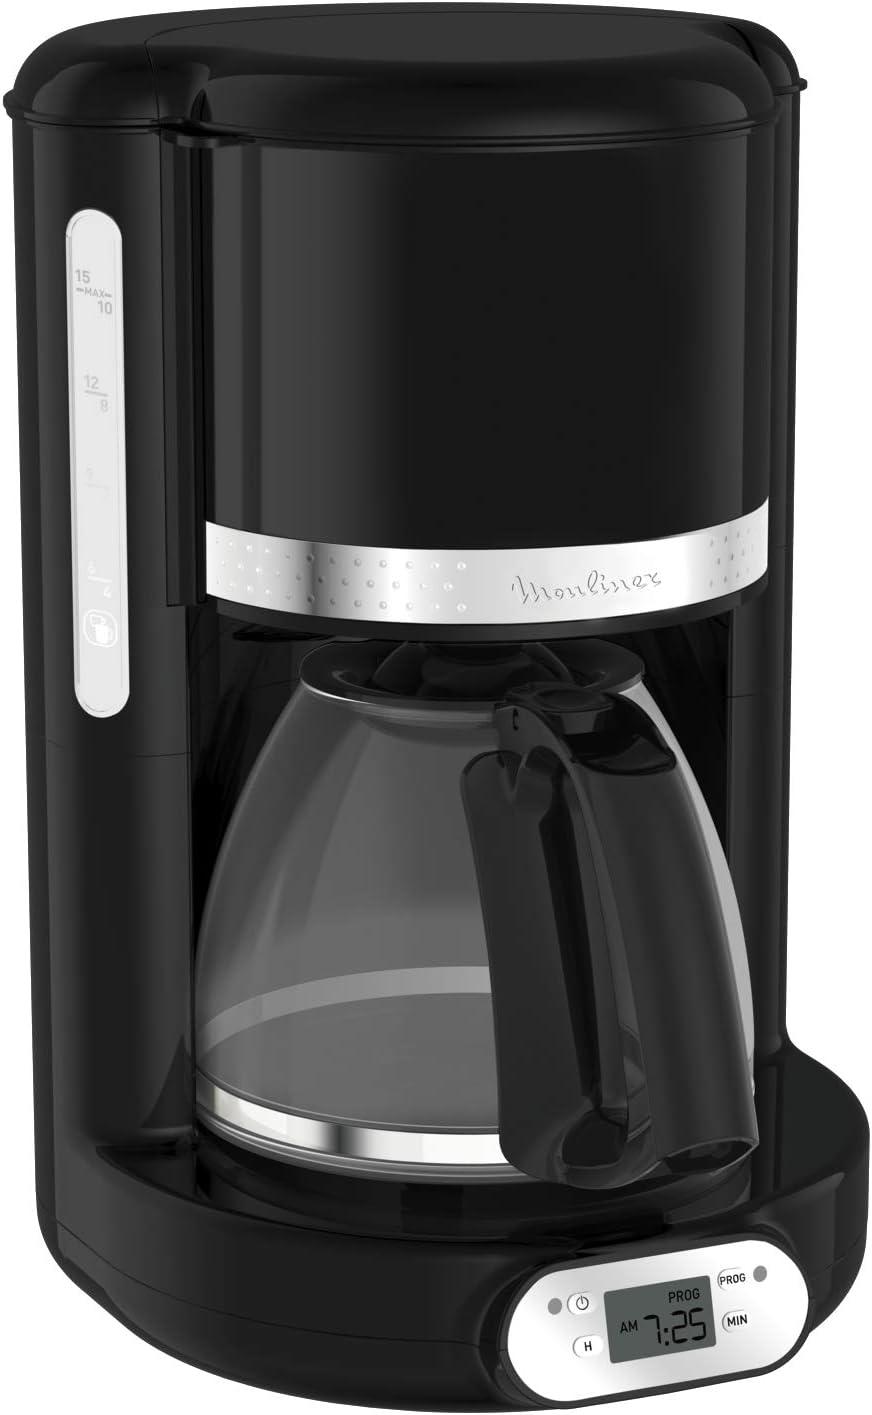 Moulinex Soleil - Cafetera con filtro programable para cafetera FG380B10